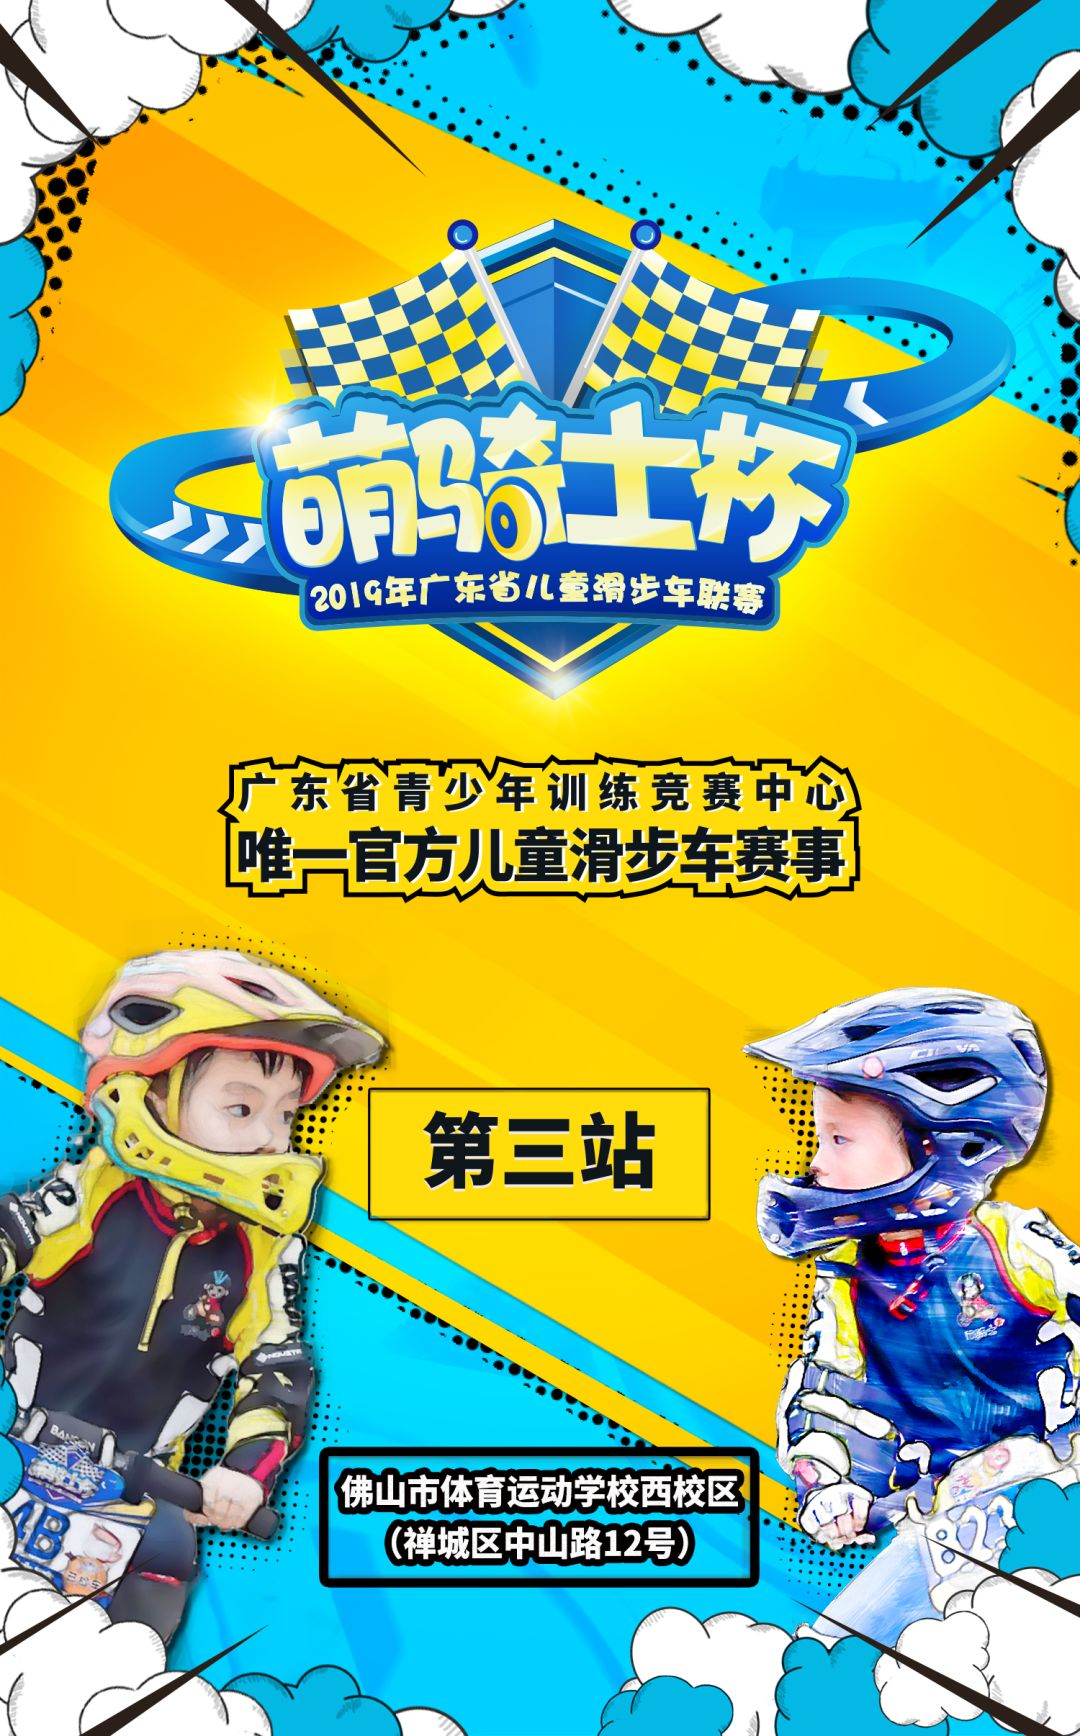 <b>萌骑士杯5月25日佛山开赛!赛事指南戳→</b>